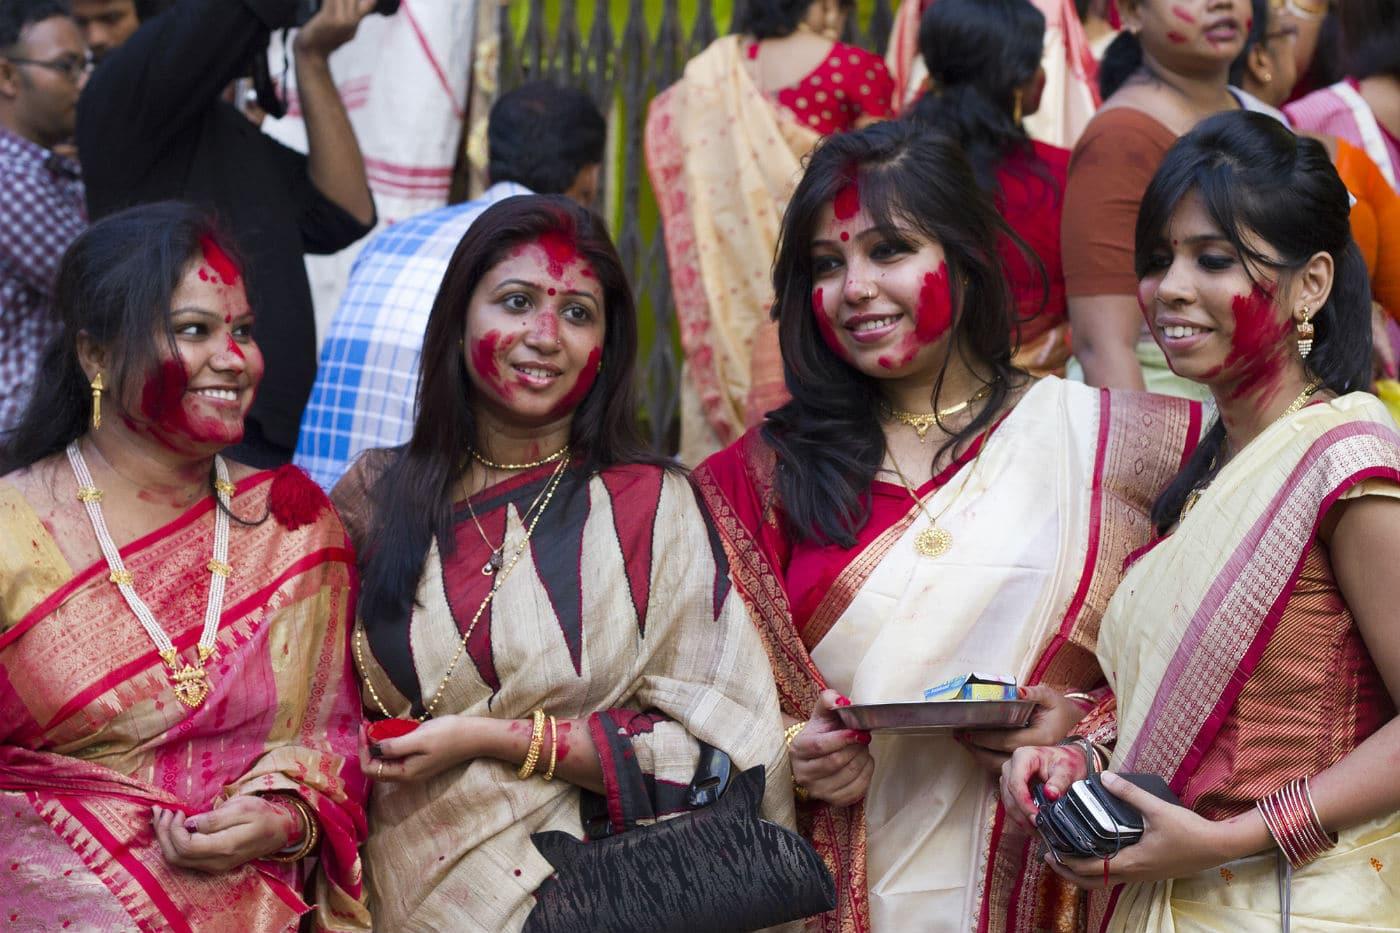 Counterfeit Spirits in festival of Durga Puja in Kolkata